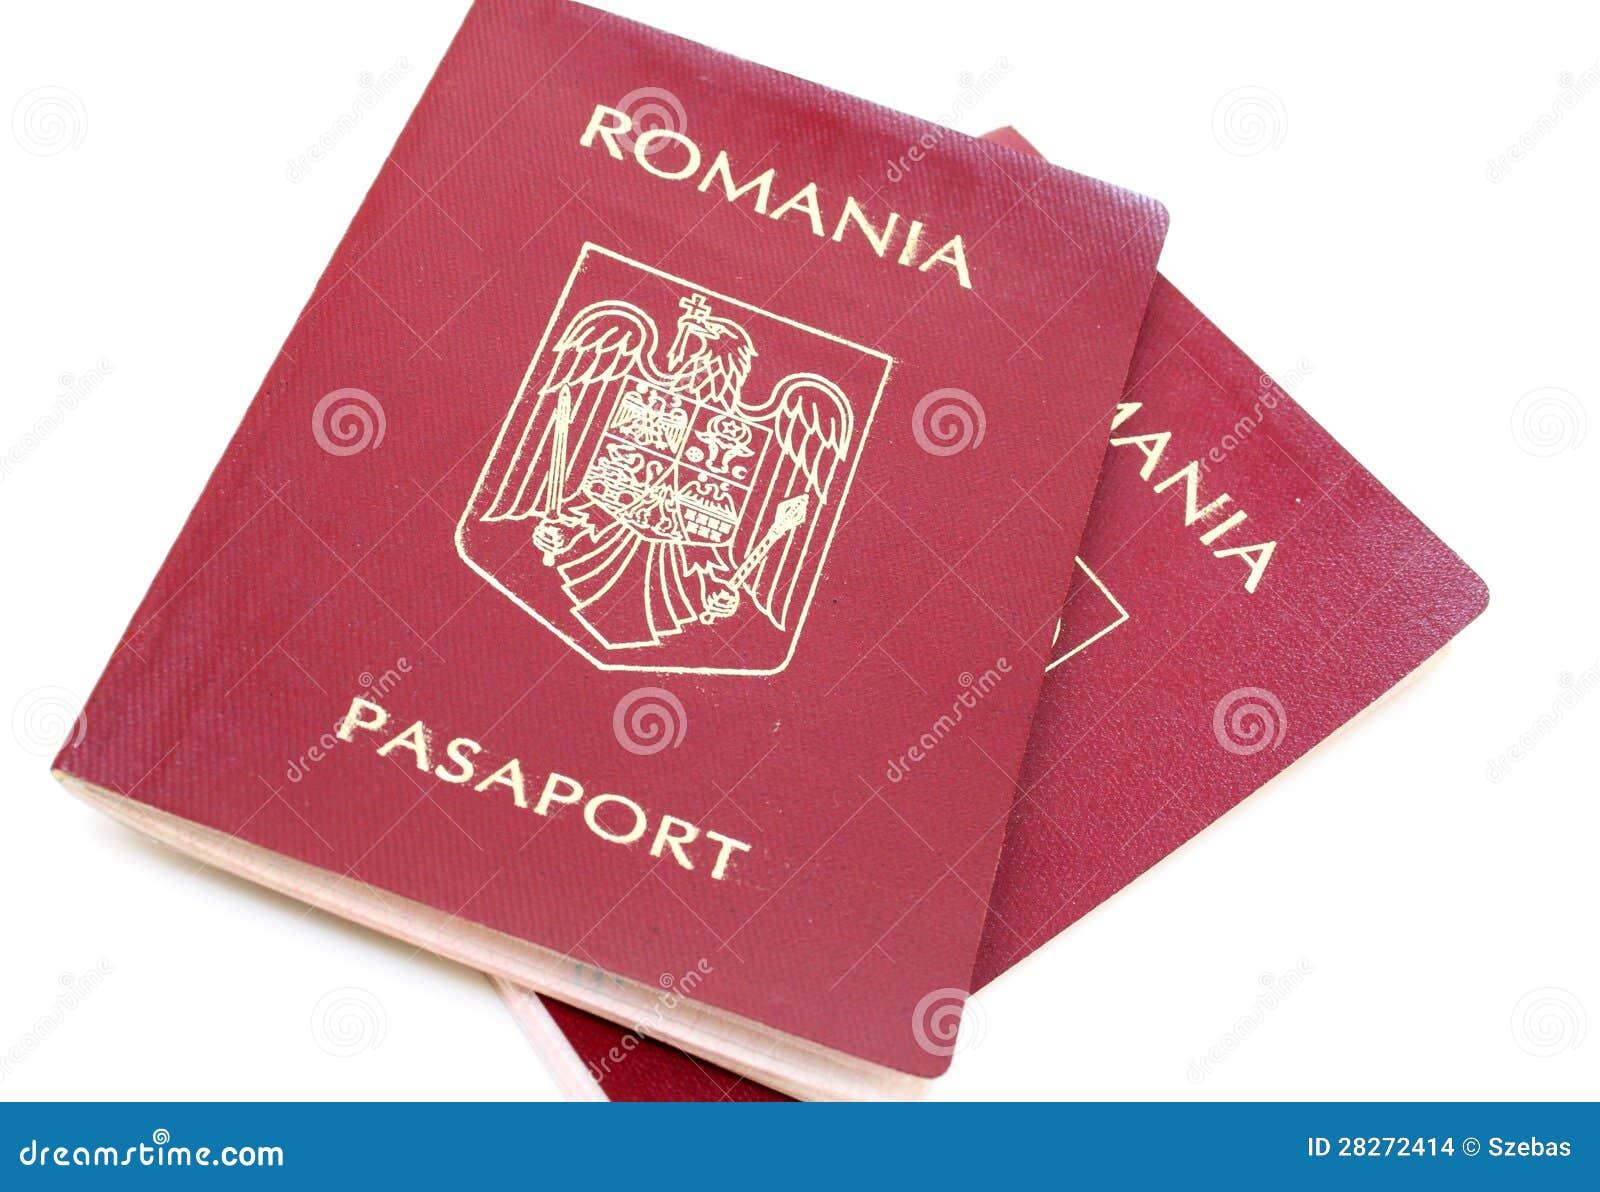 renew romanian passport in usa